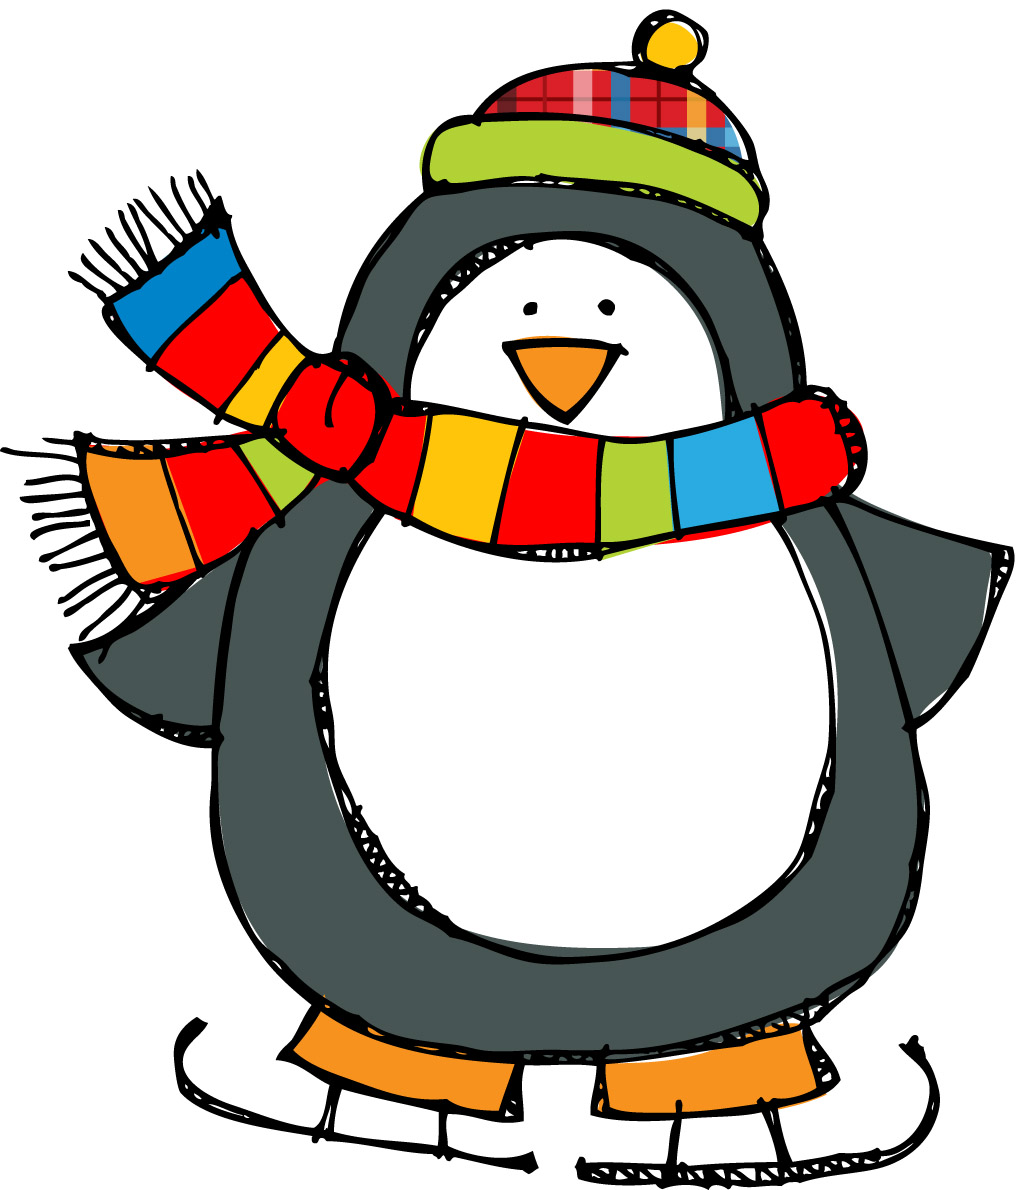 1018x1190 Hccc Closed For Christmas Holliston Community Children's Center